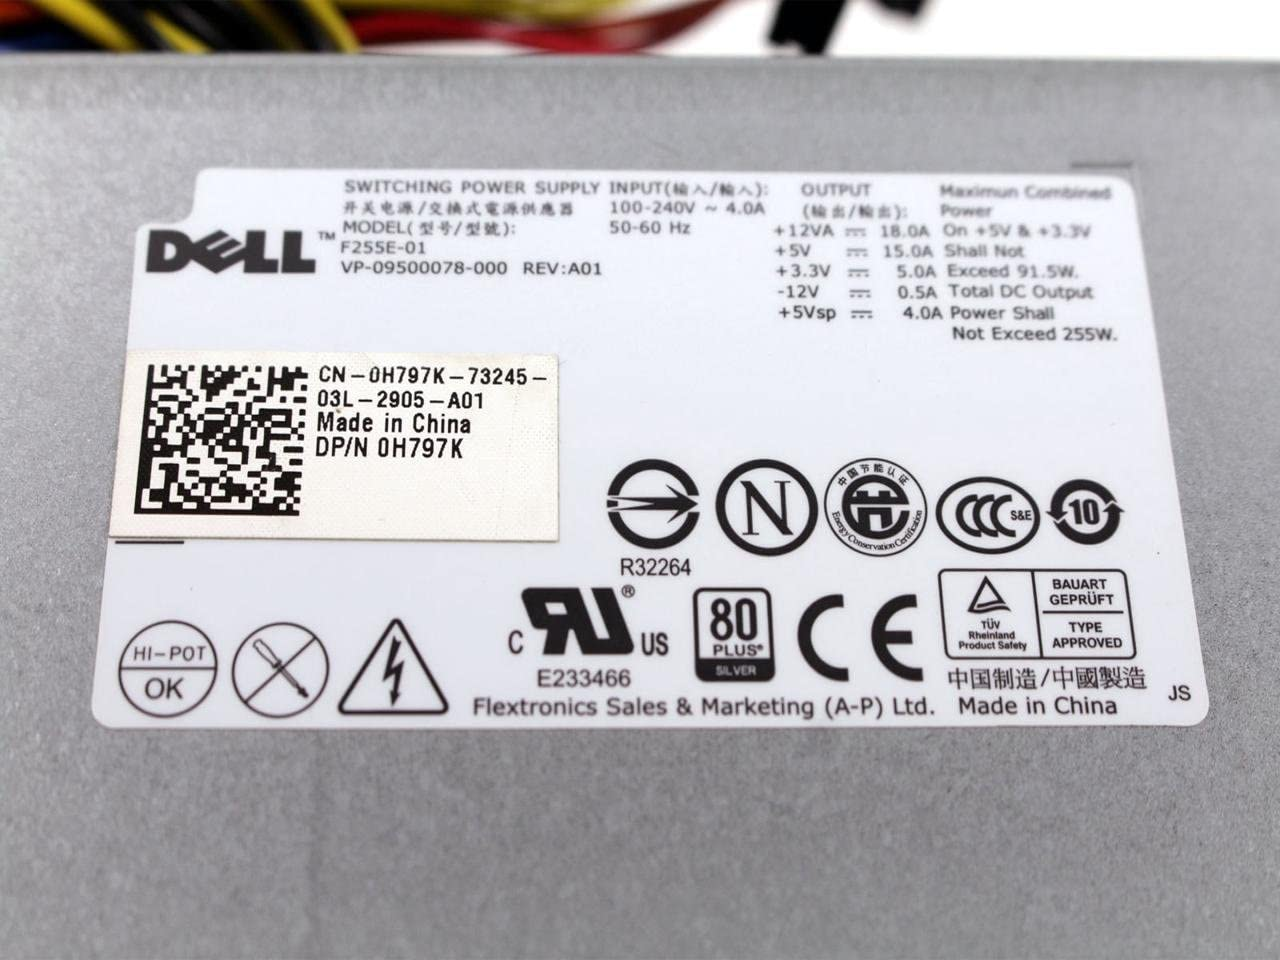 Dell Optiplex 360 380 1 Fan 225W 100-240V Switching Power Supply F255E-01 H797K 0H797K CN-0H797K